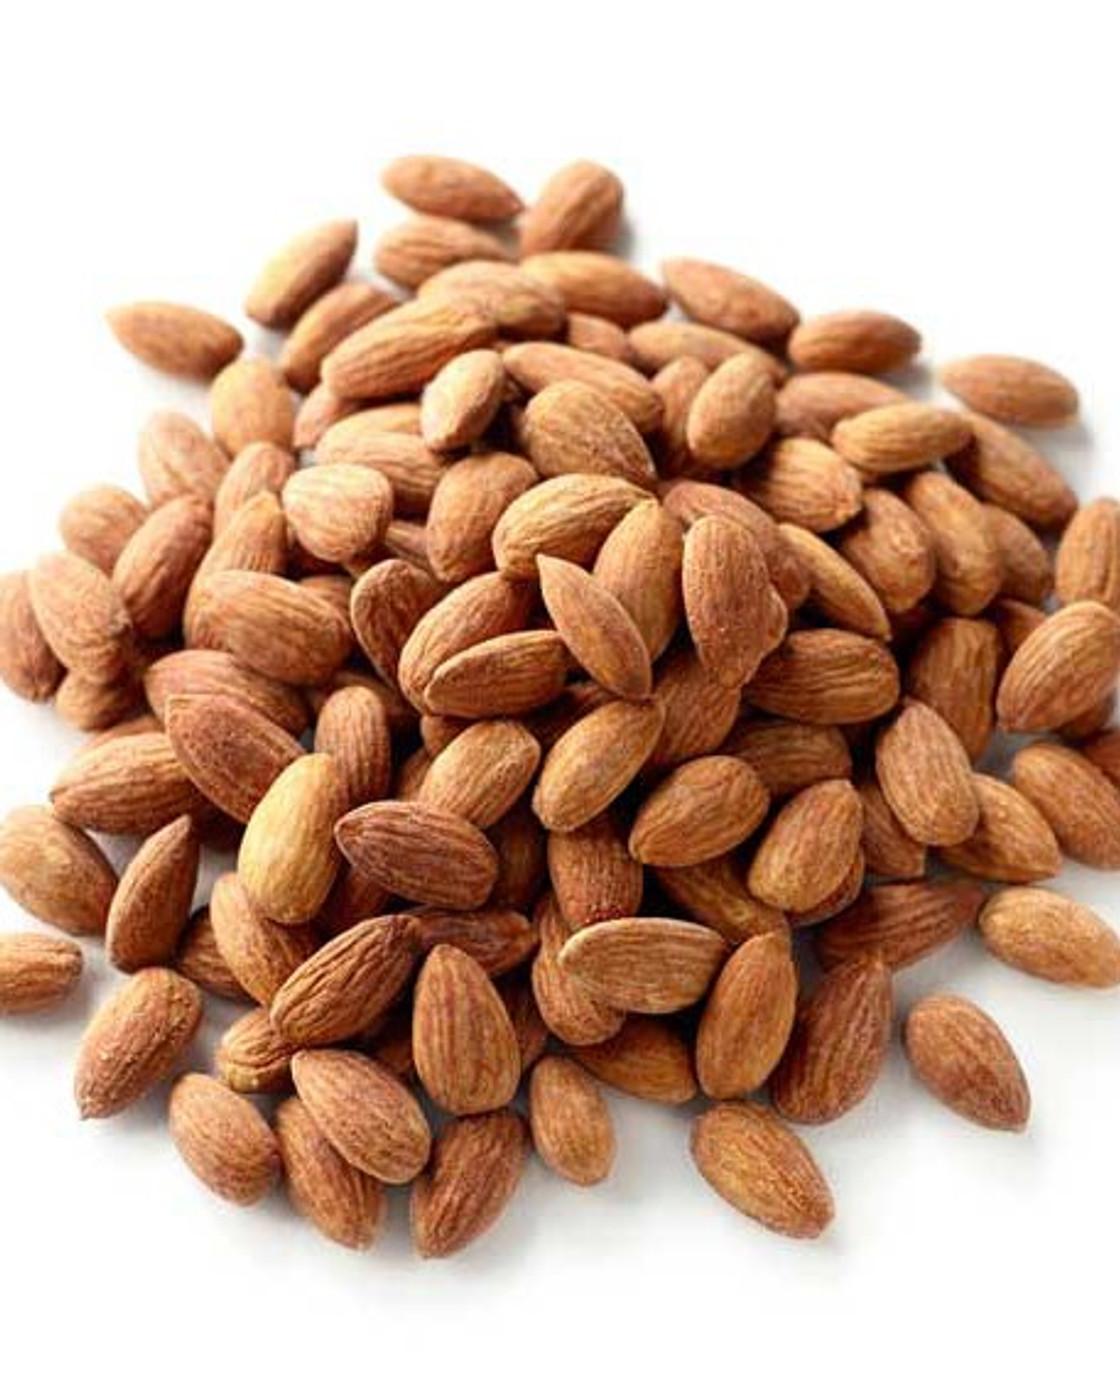 Dry Roasted Sea Salted Almonds